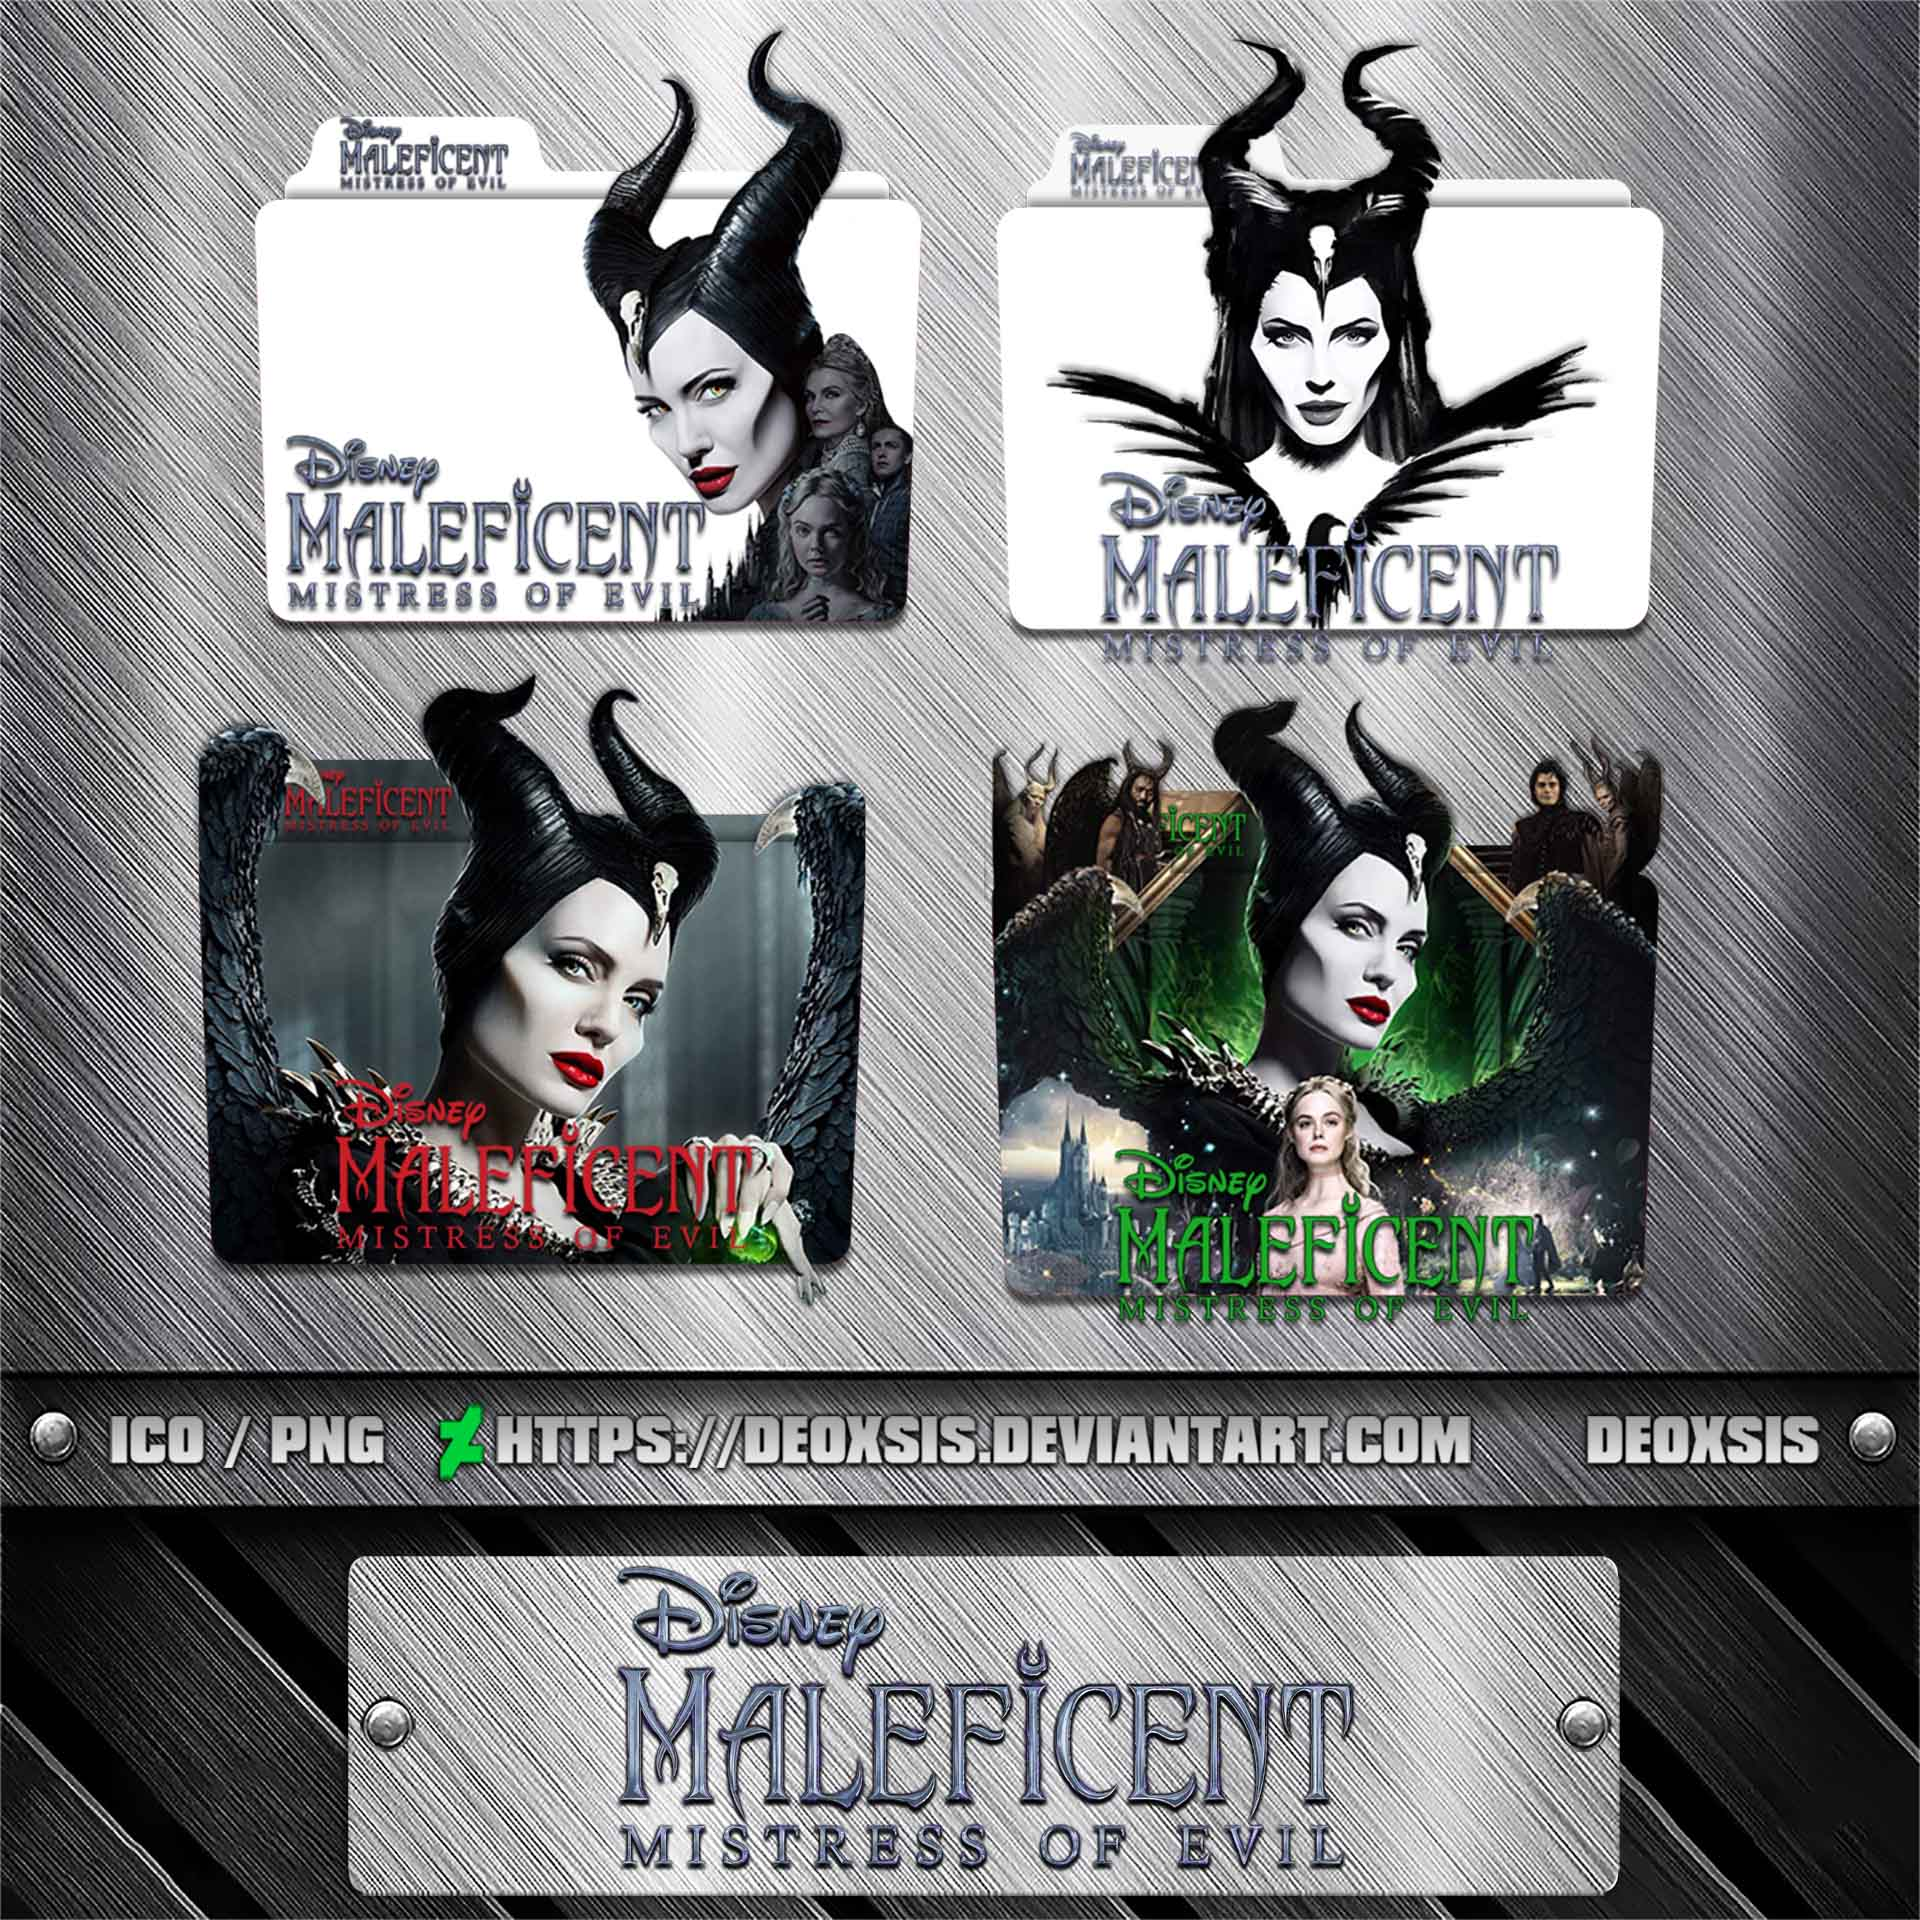 Maleficent Mistress Of Evil 2019 Foldericonpack By Deoxsis On Deviantart